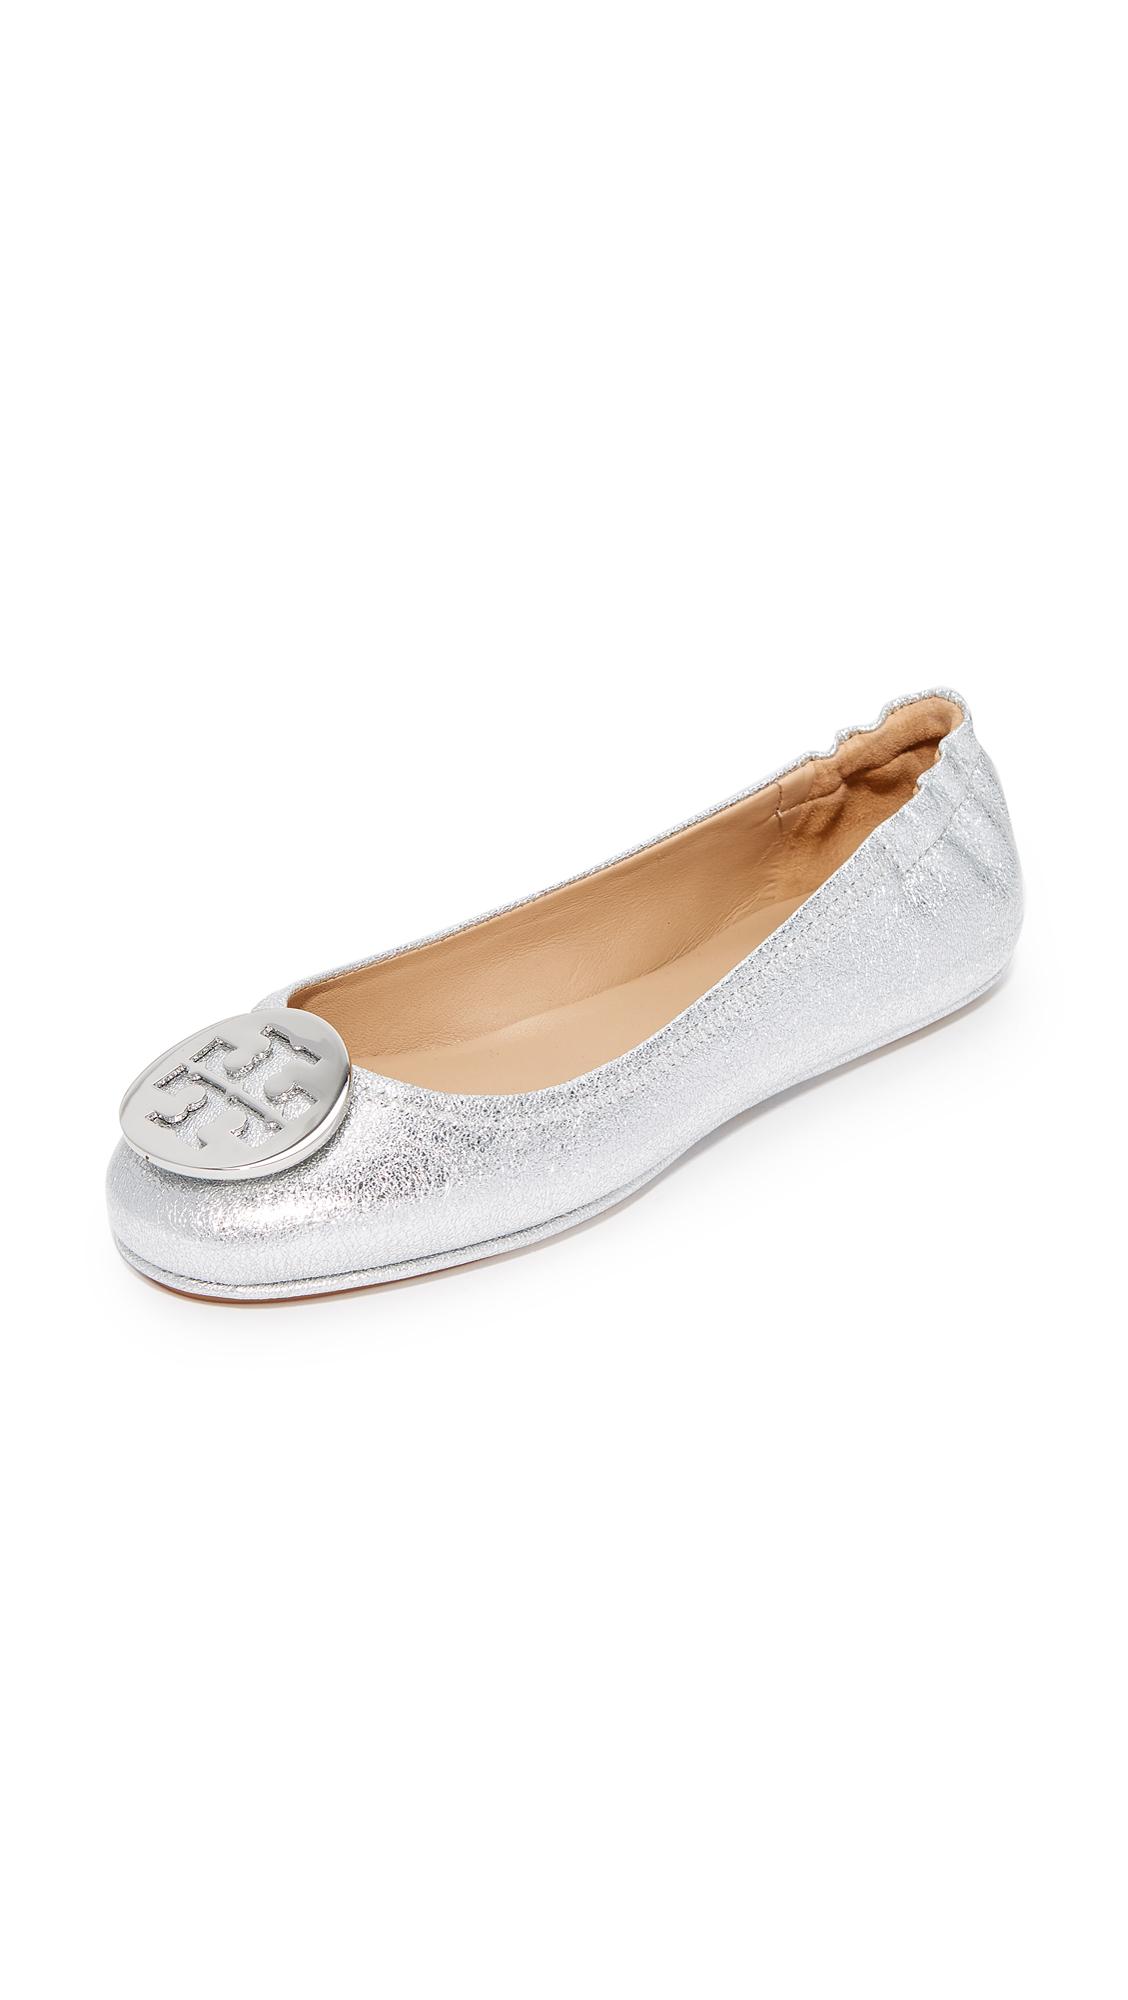 d6c16f20501 Tory Burch Minnie Travel Ballet Flats